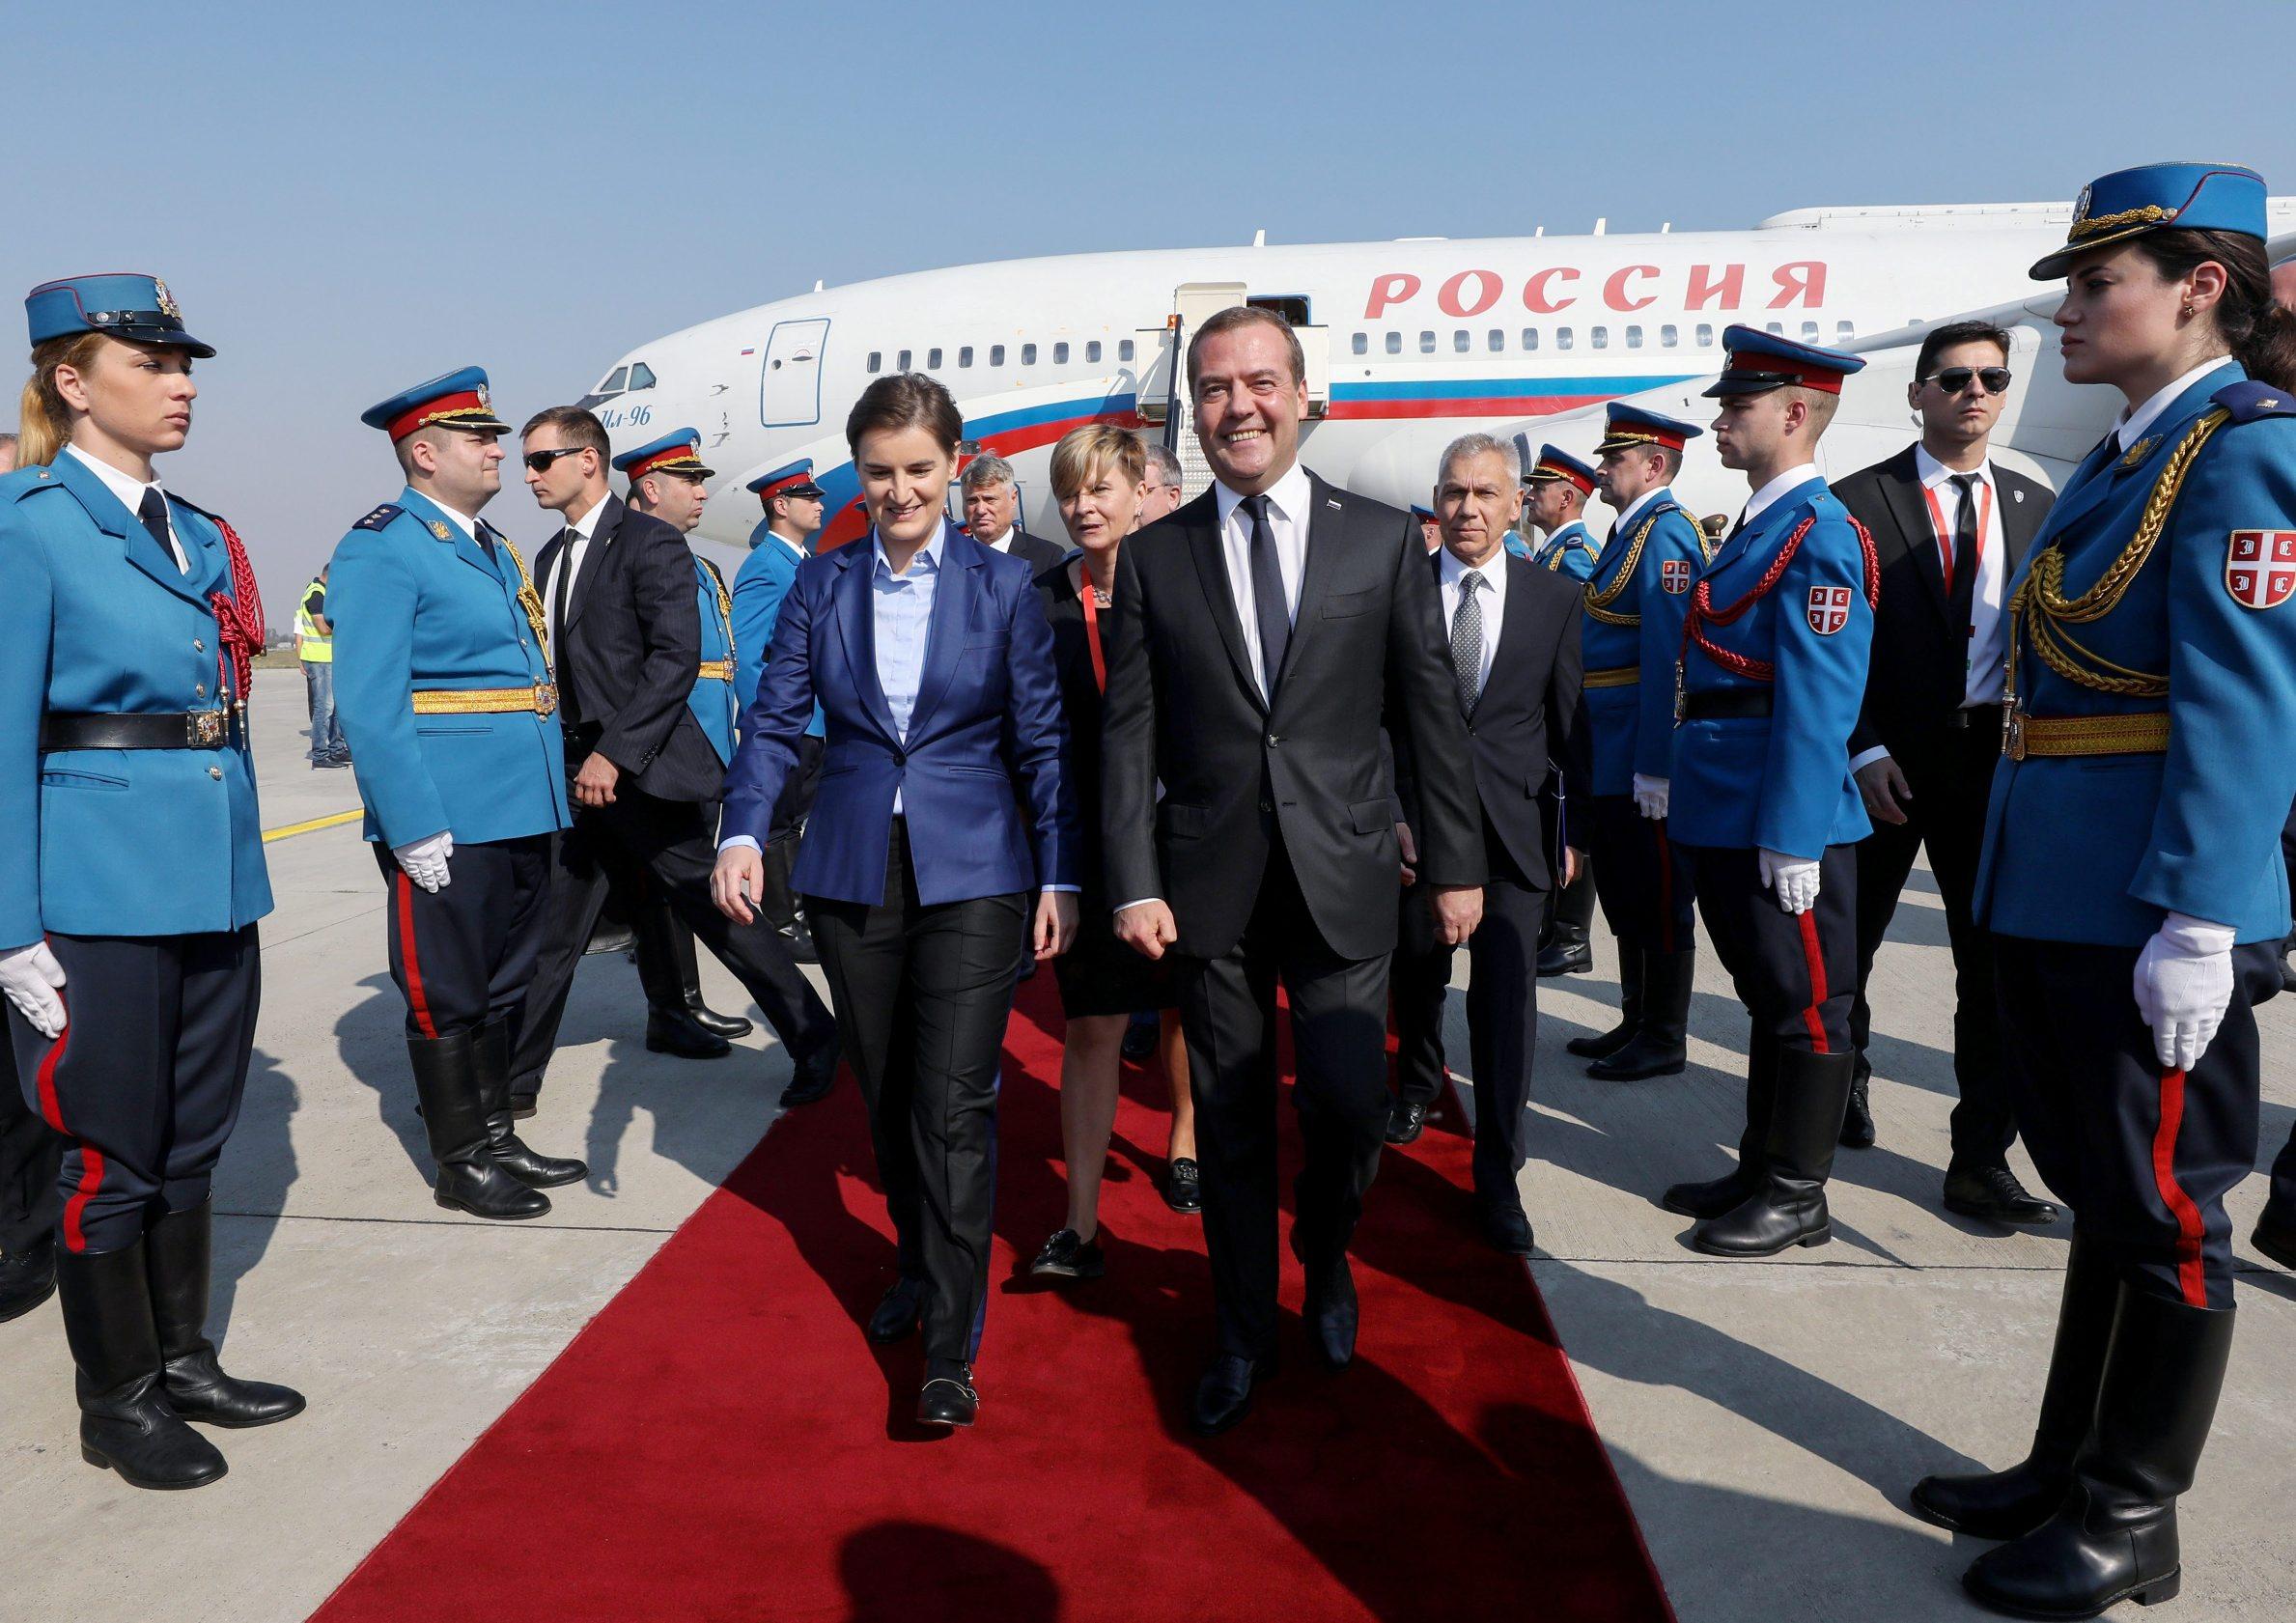 Prije potpisivanja sporazuma, ruski premijer Dmitrij Medvedev je došao u posjet Beogradu: dočekala ga je premijerka Ana Brnabić